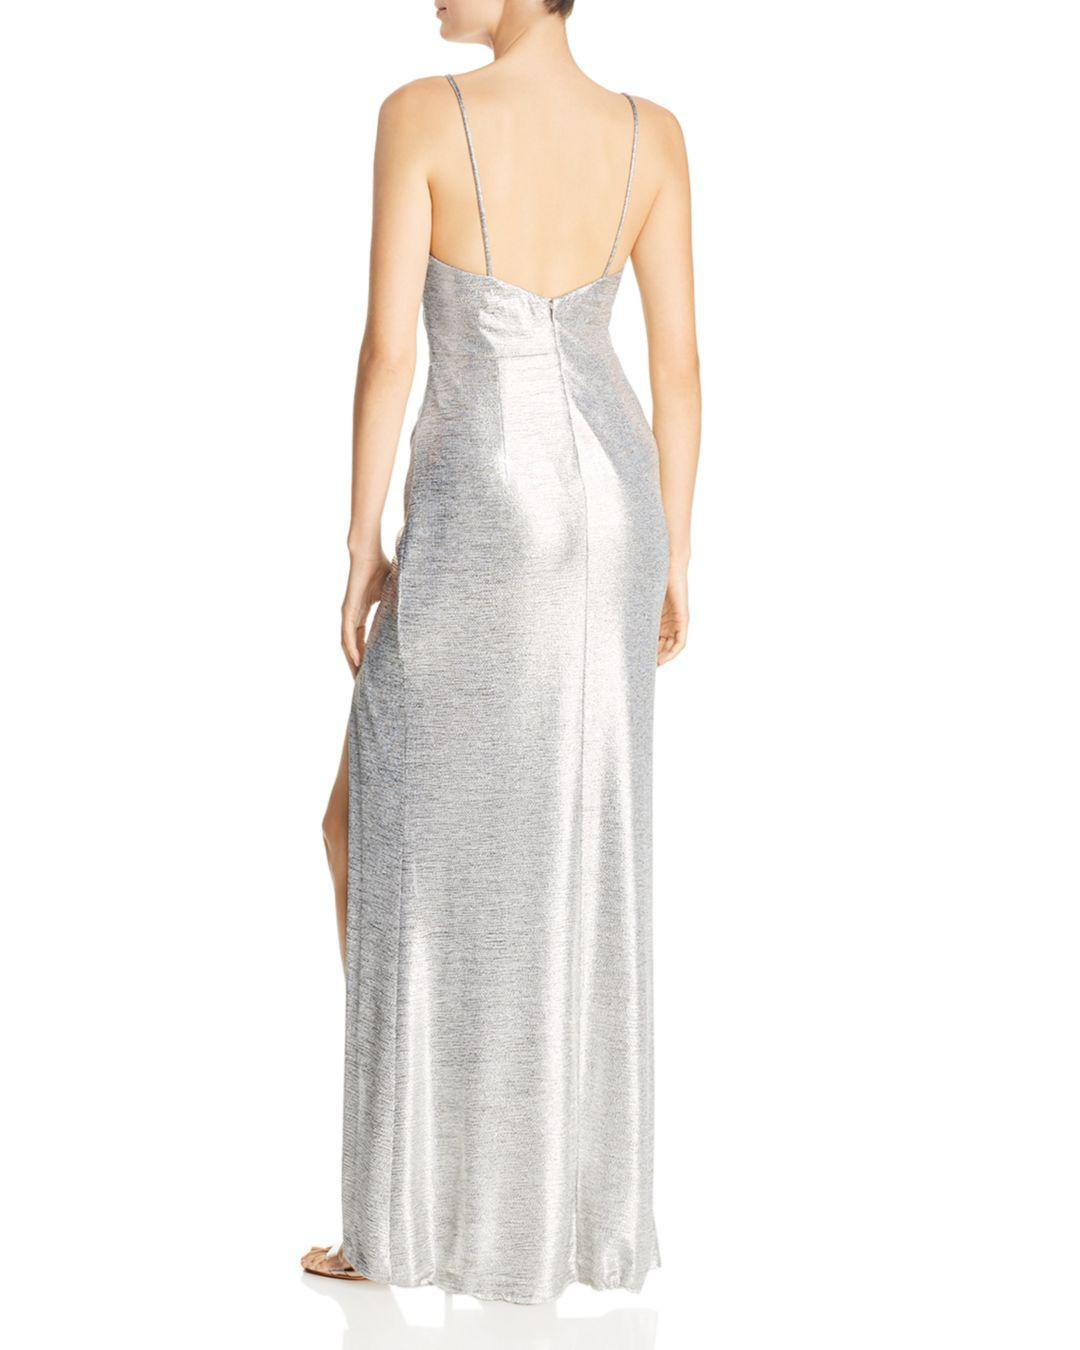 6992714d47545 Betsy & Adam Metallic Knit Drape-neck Gown in Metallic - Lyst